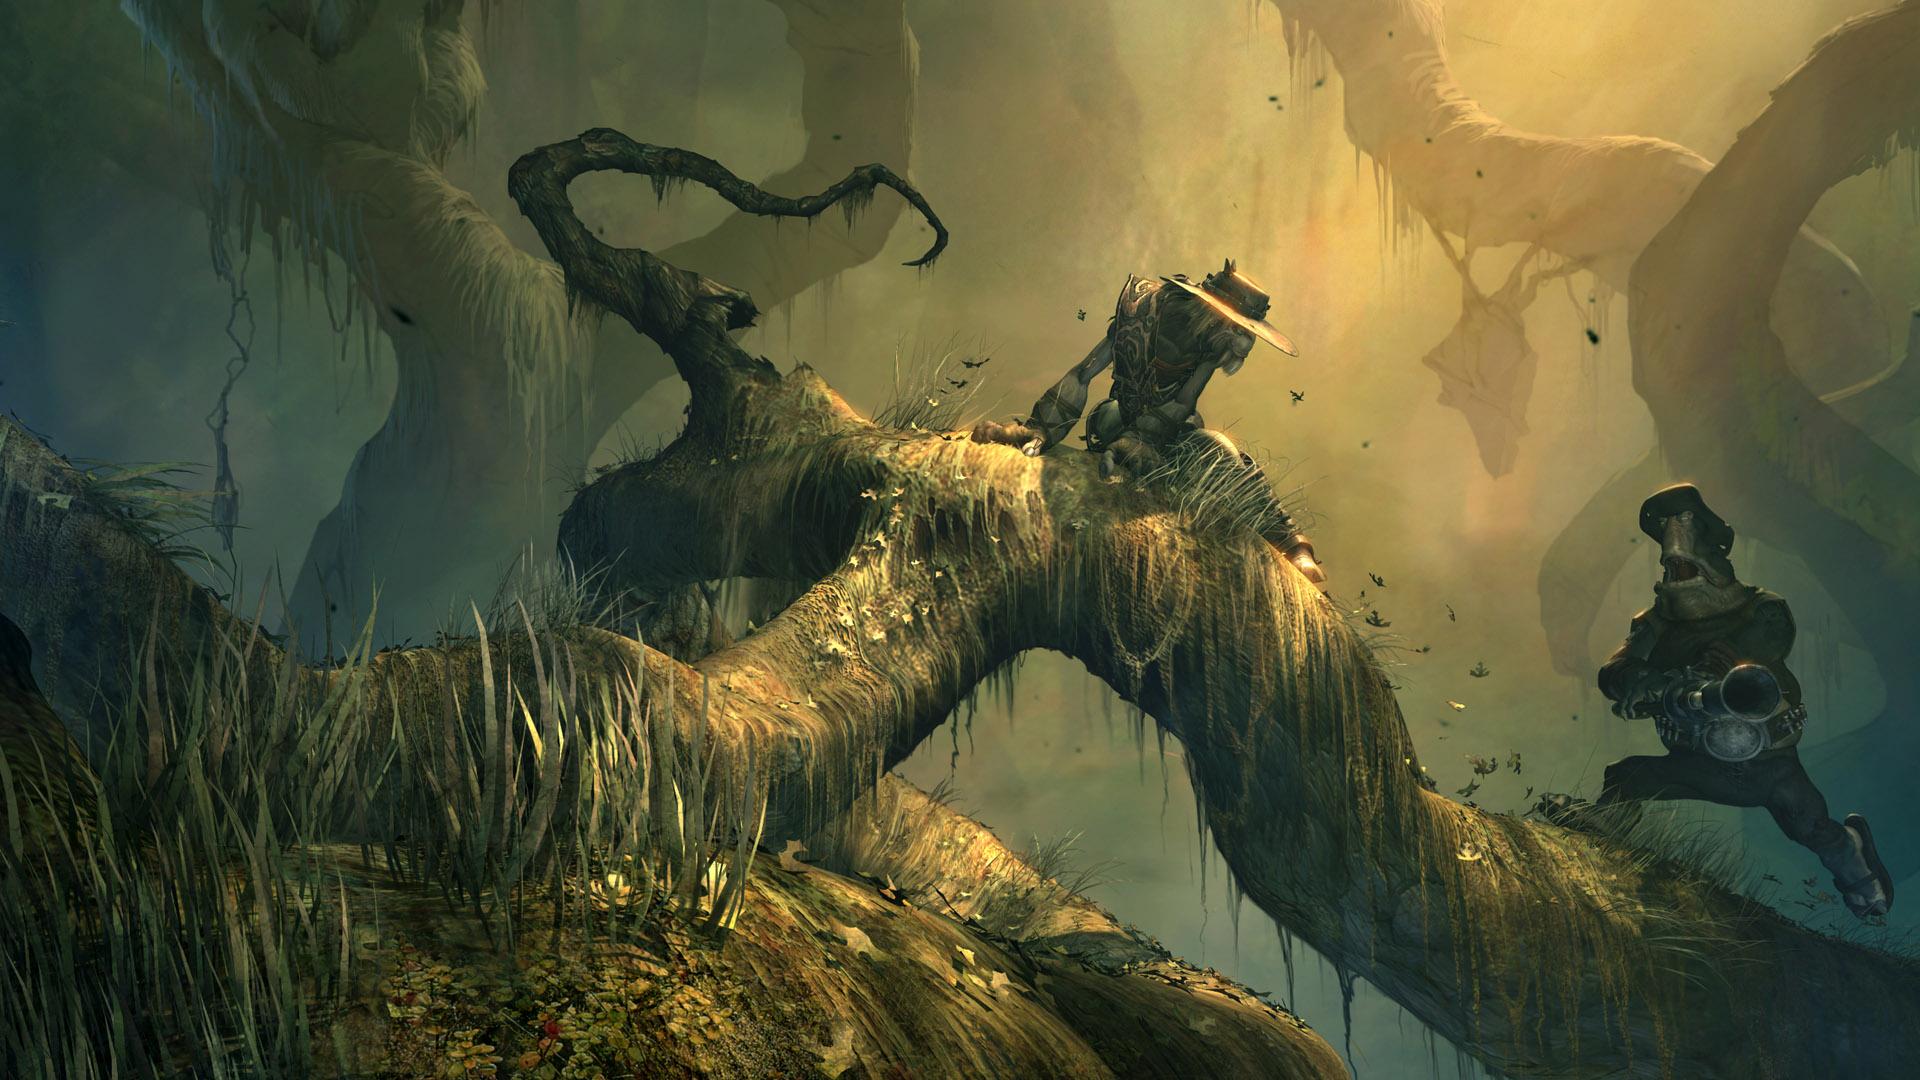 Oddworld hd wallpaper background image 1920x1080 id - Fantasy game wallpaper ...